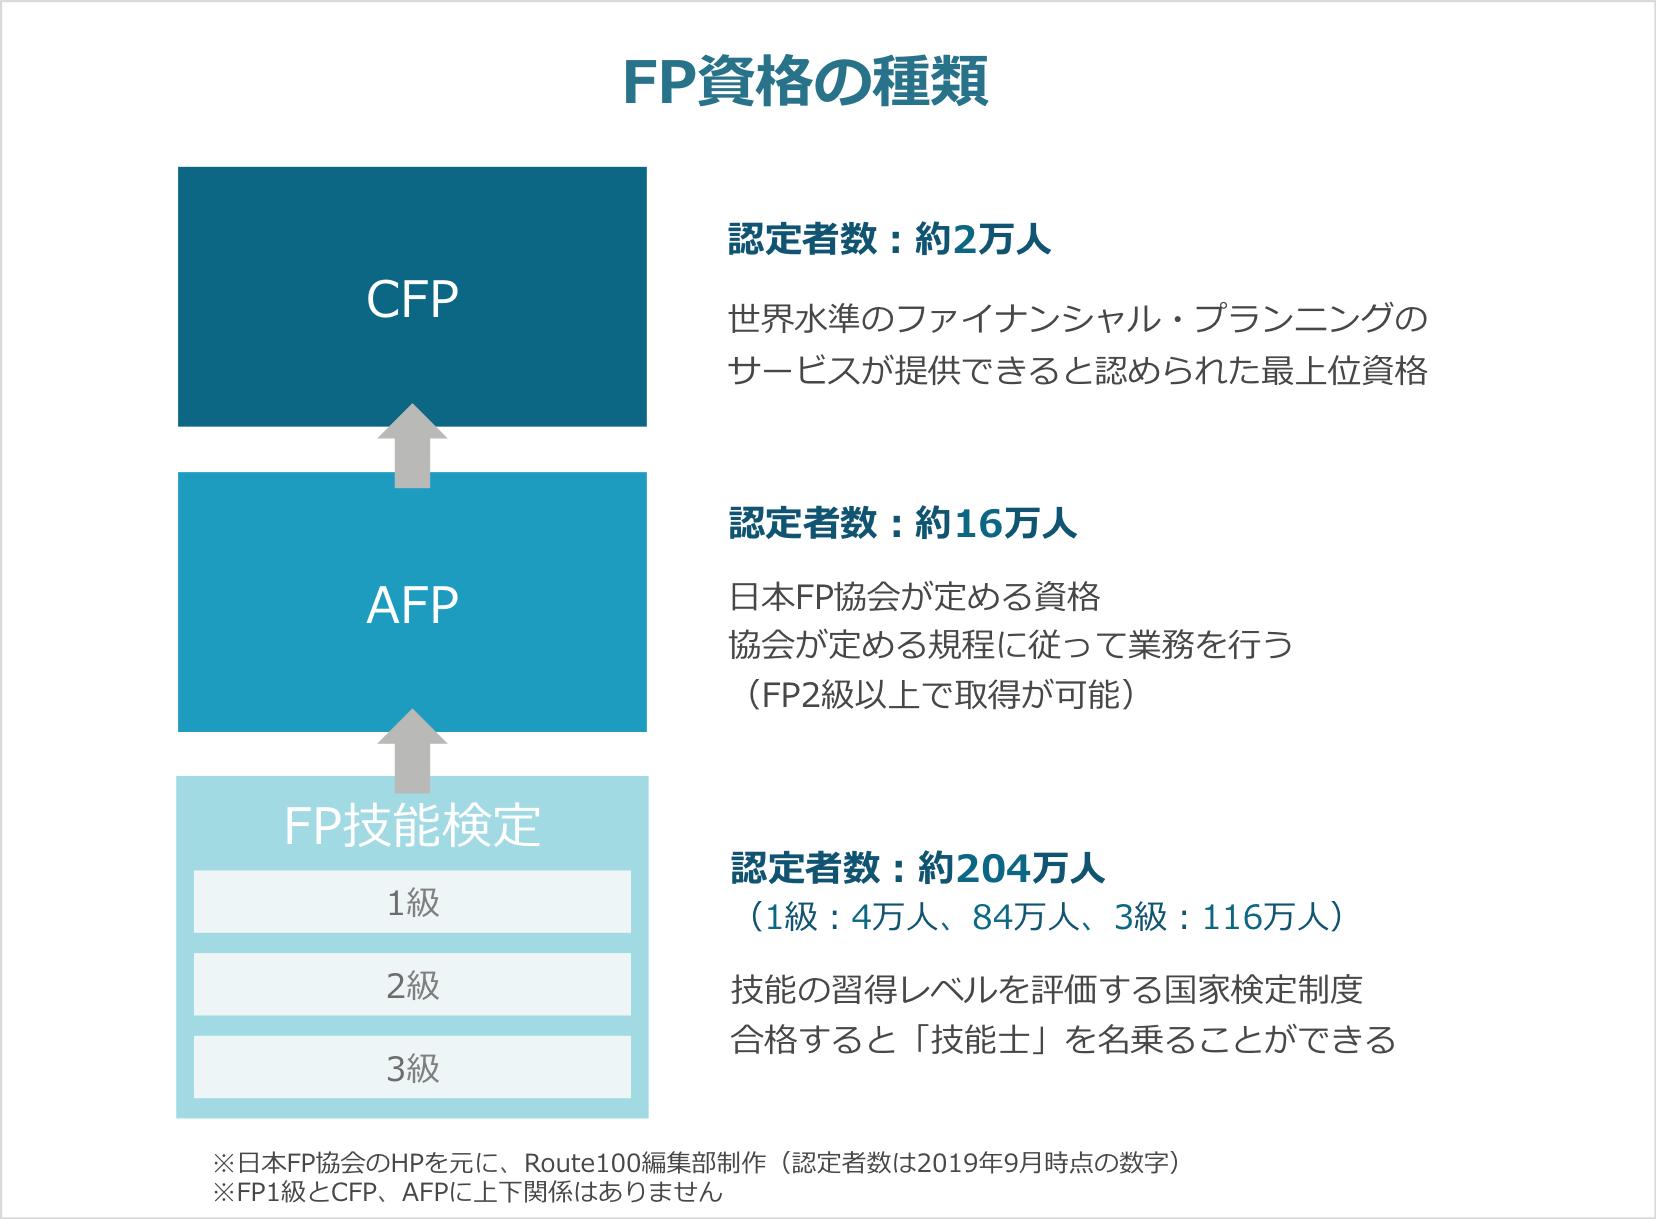 FP資格の種類